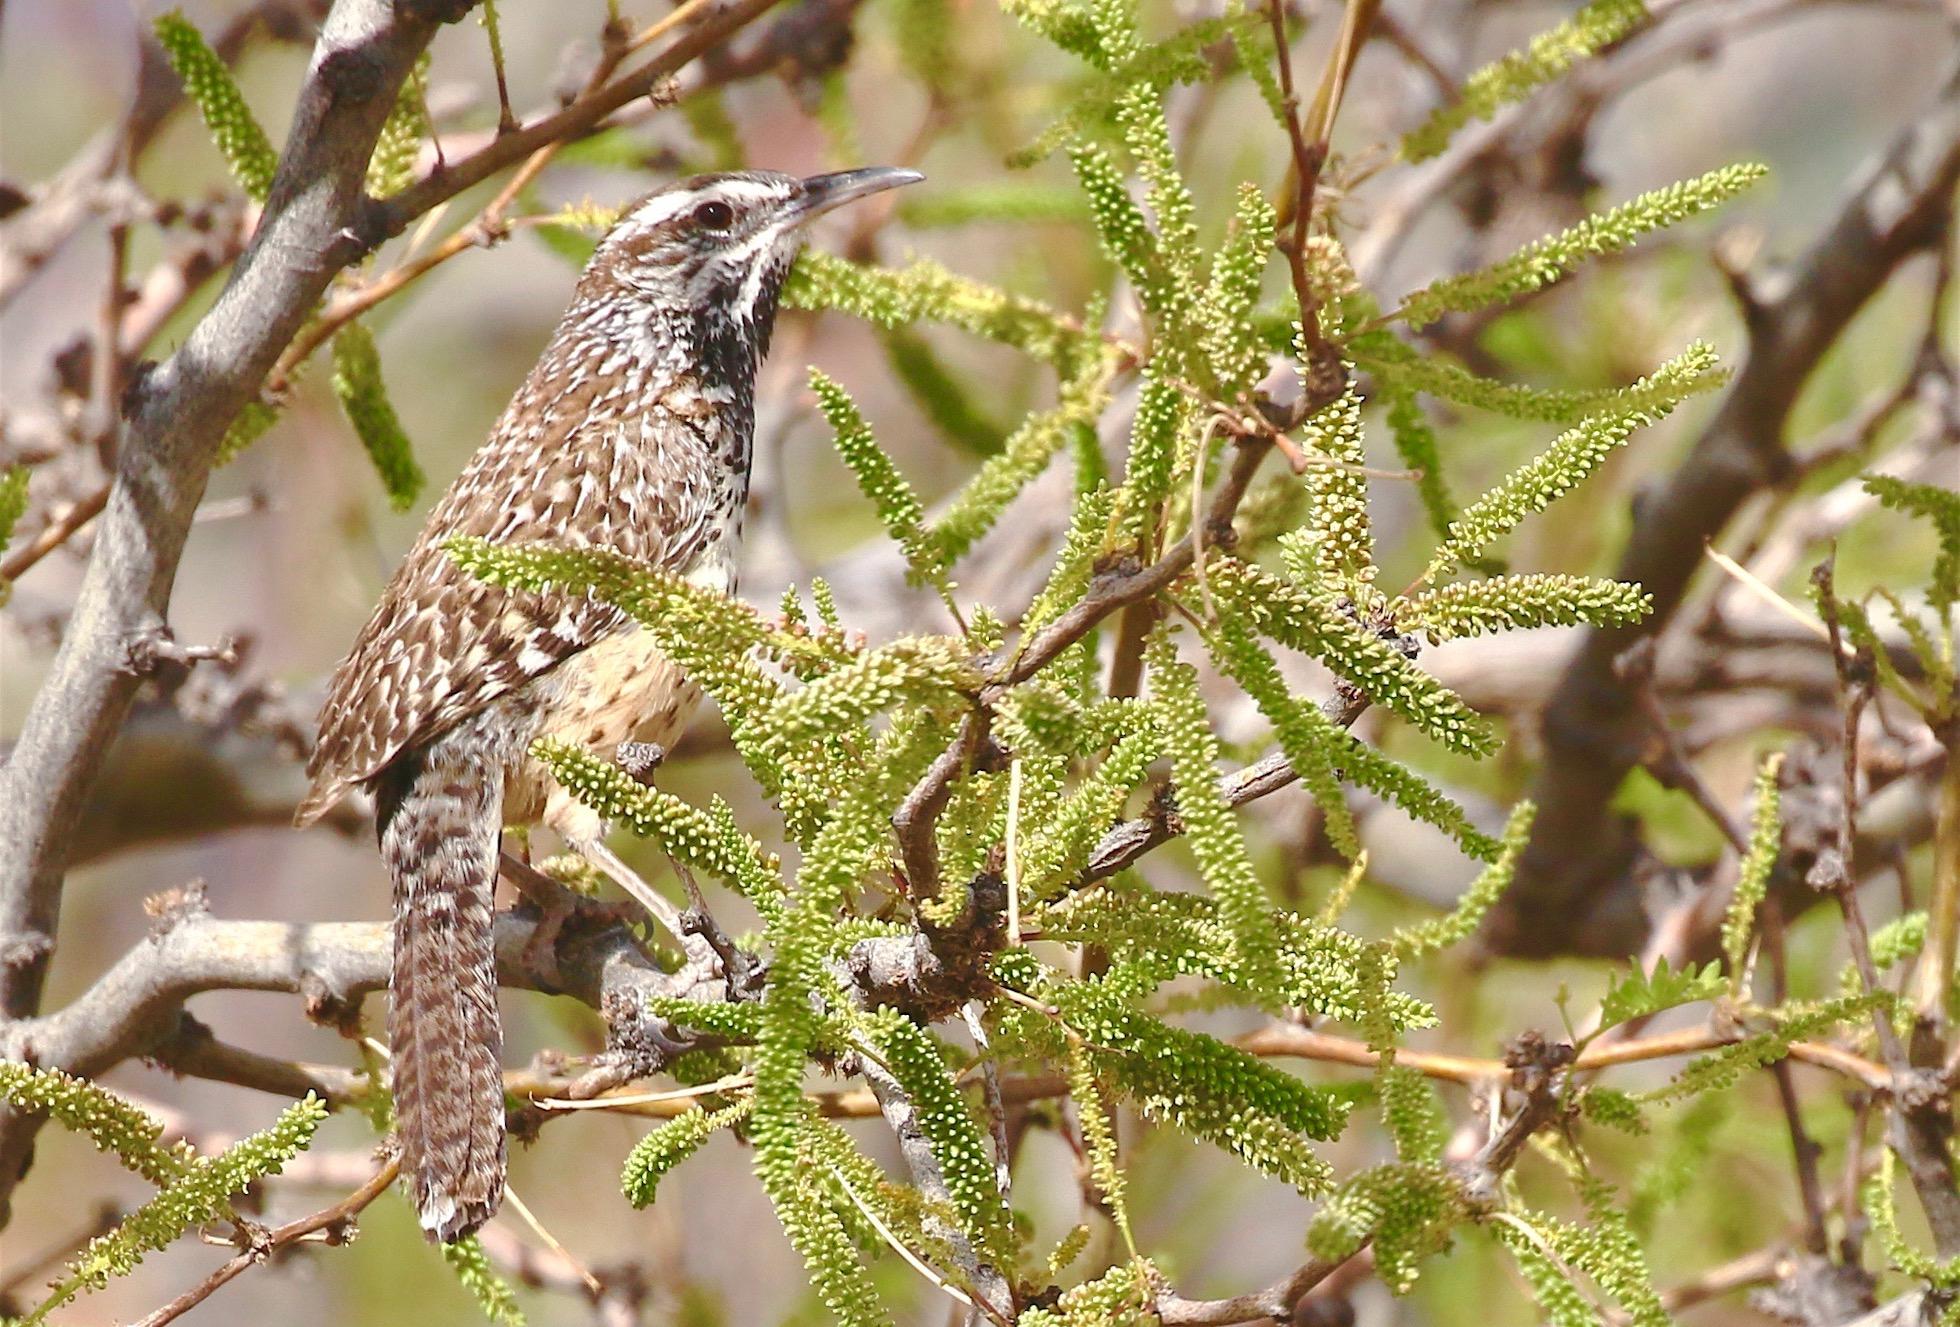 Field Guides Birding Tours